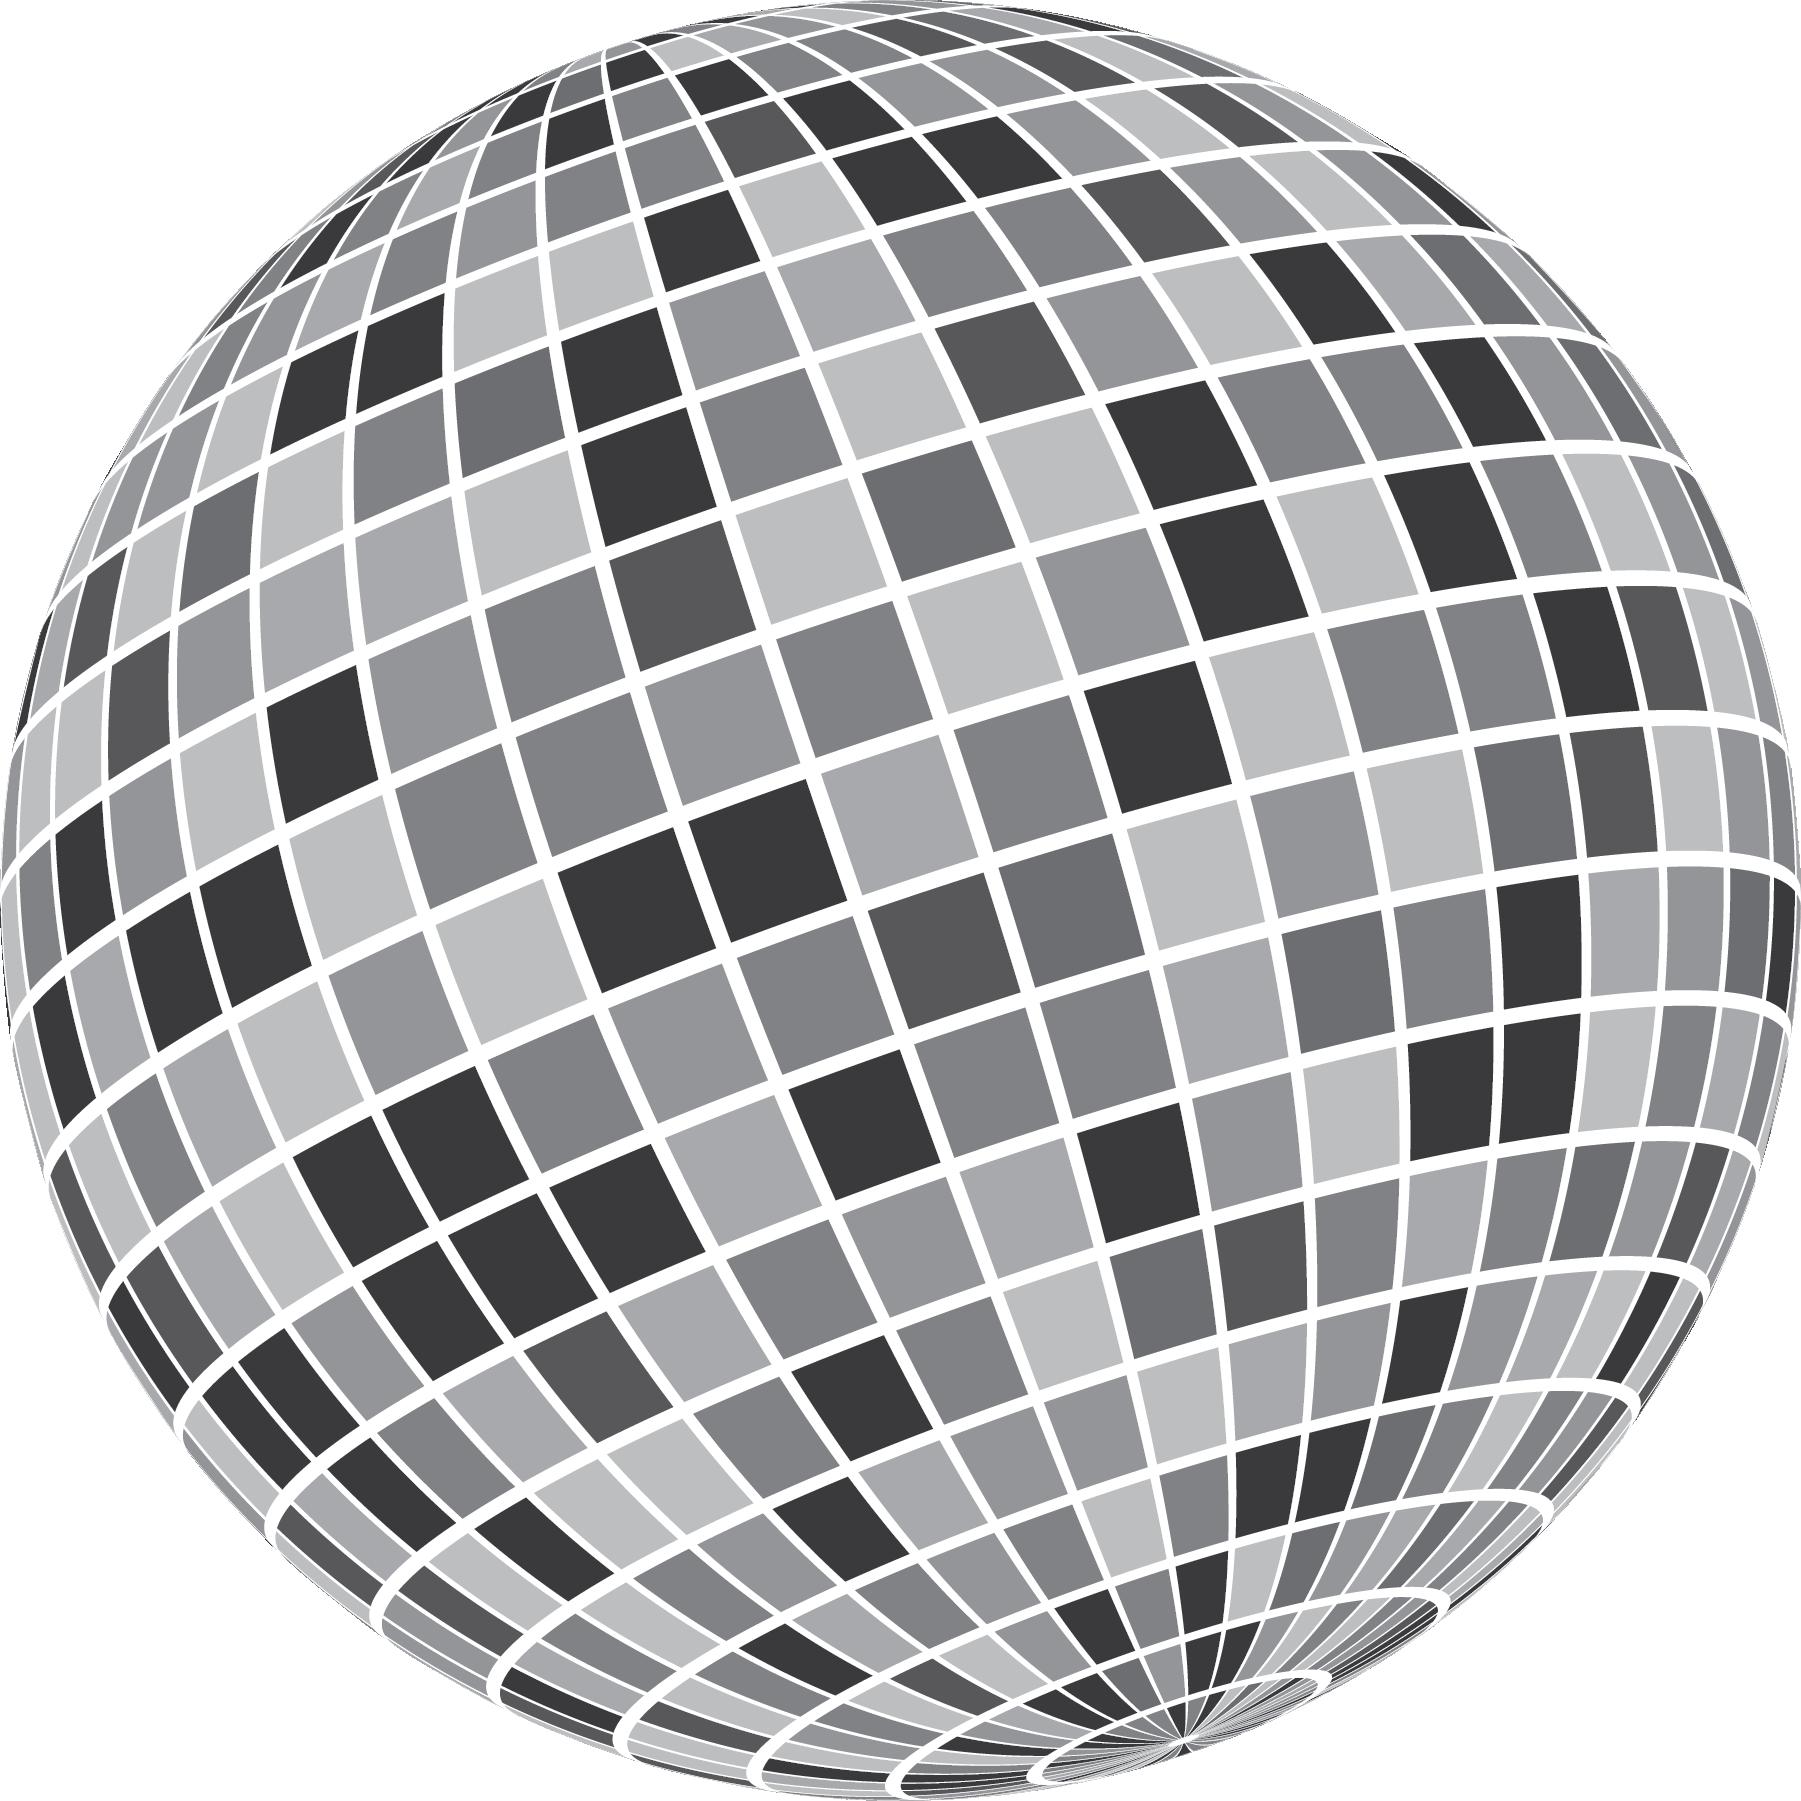 Disco Ball Drawing Disco ball drawing disco ball.